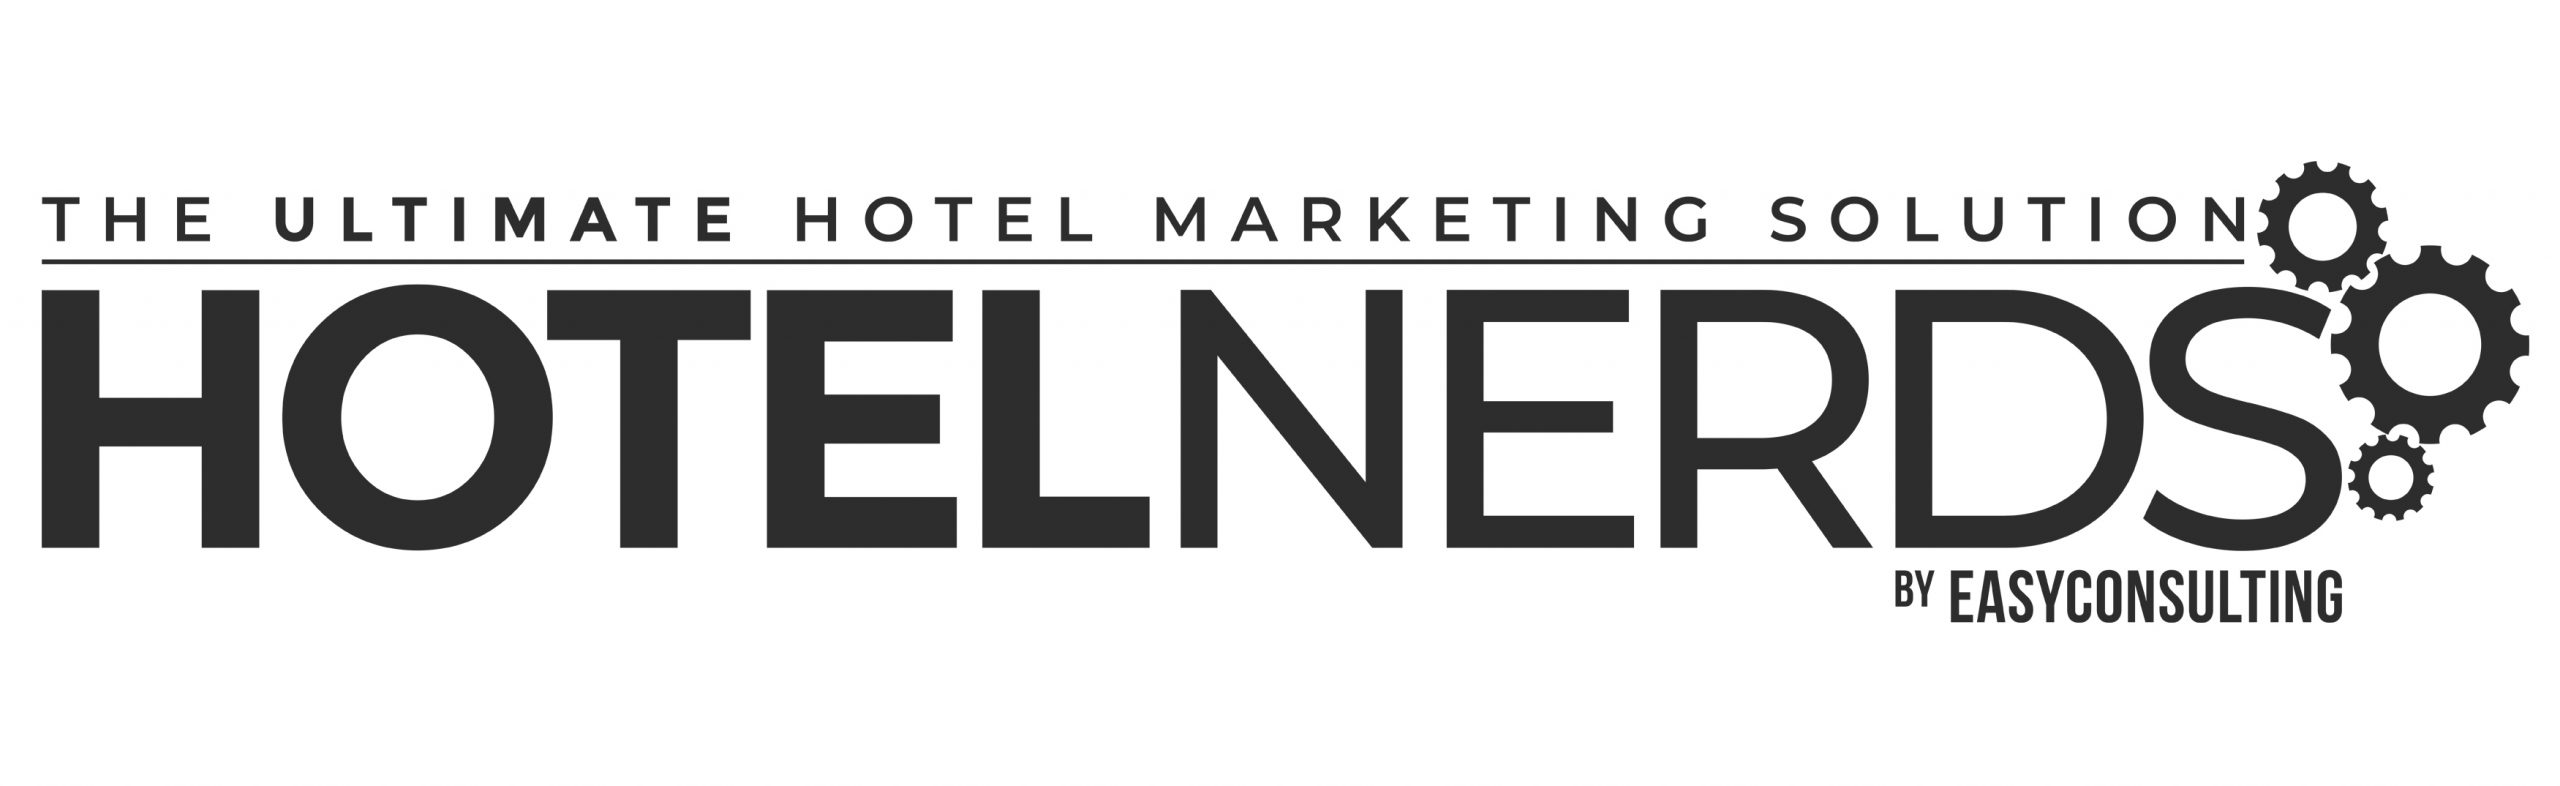 hotelnerds